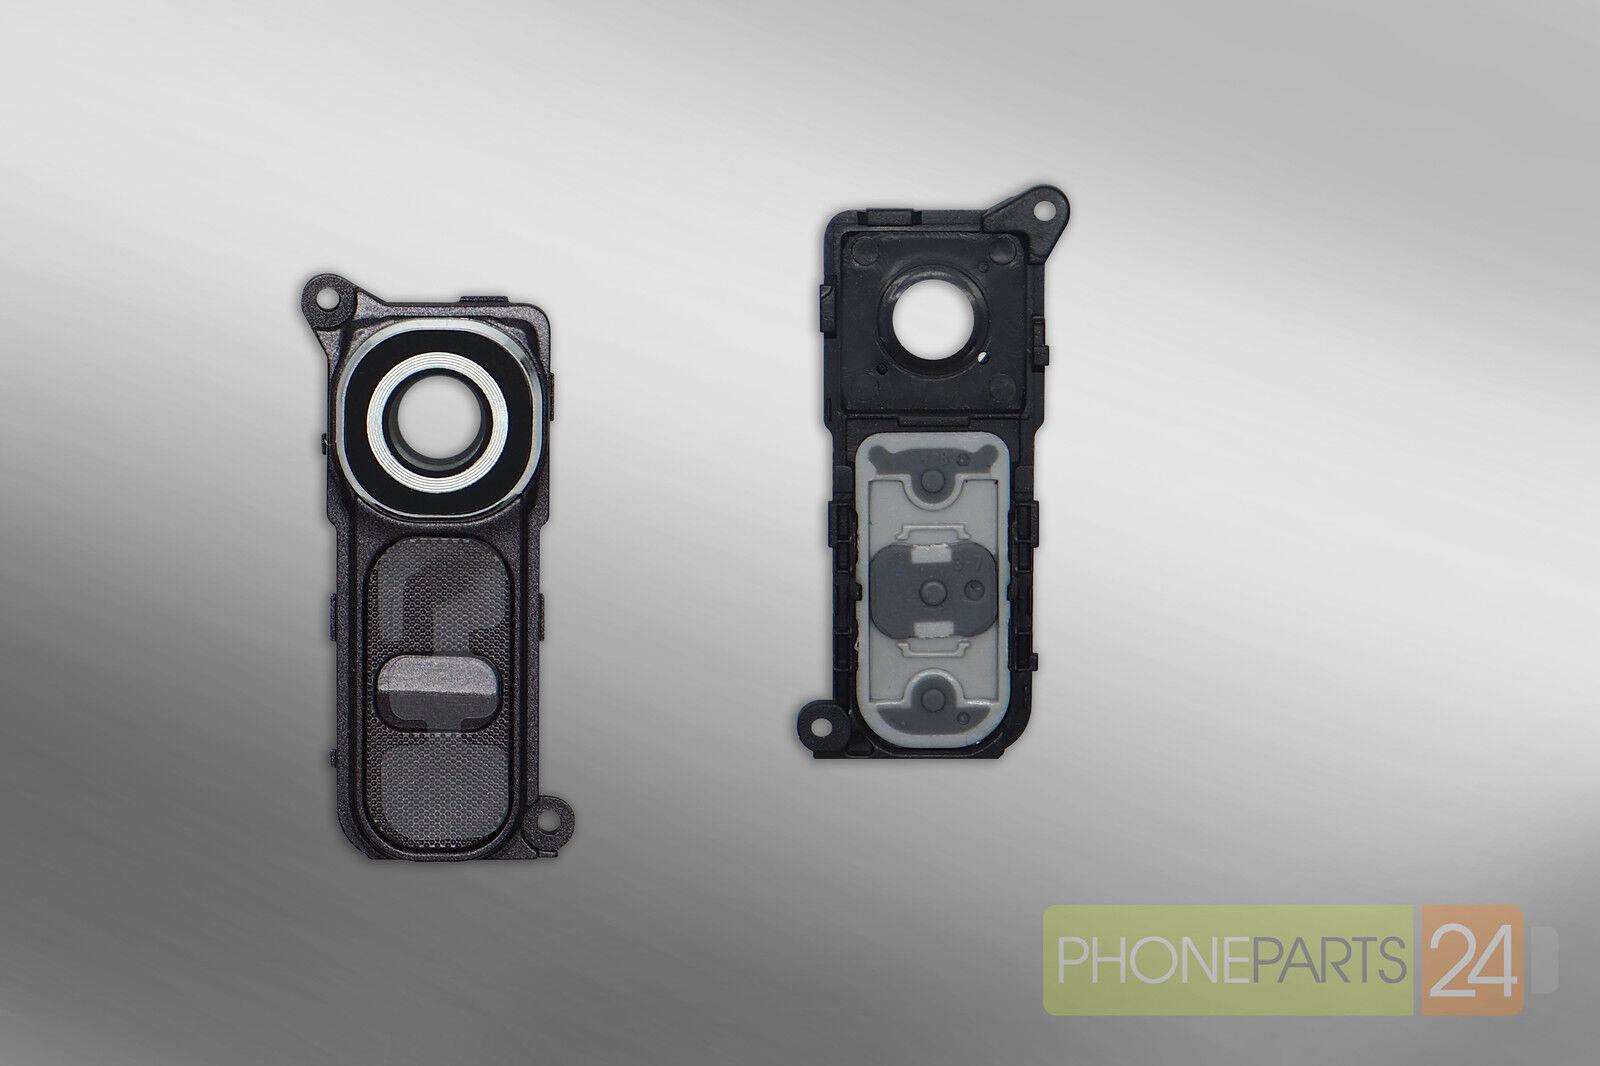 LG G4 Kamera Glas Linse Camera Glass Lens mit Rahmen/Frame und Back ...